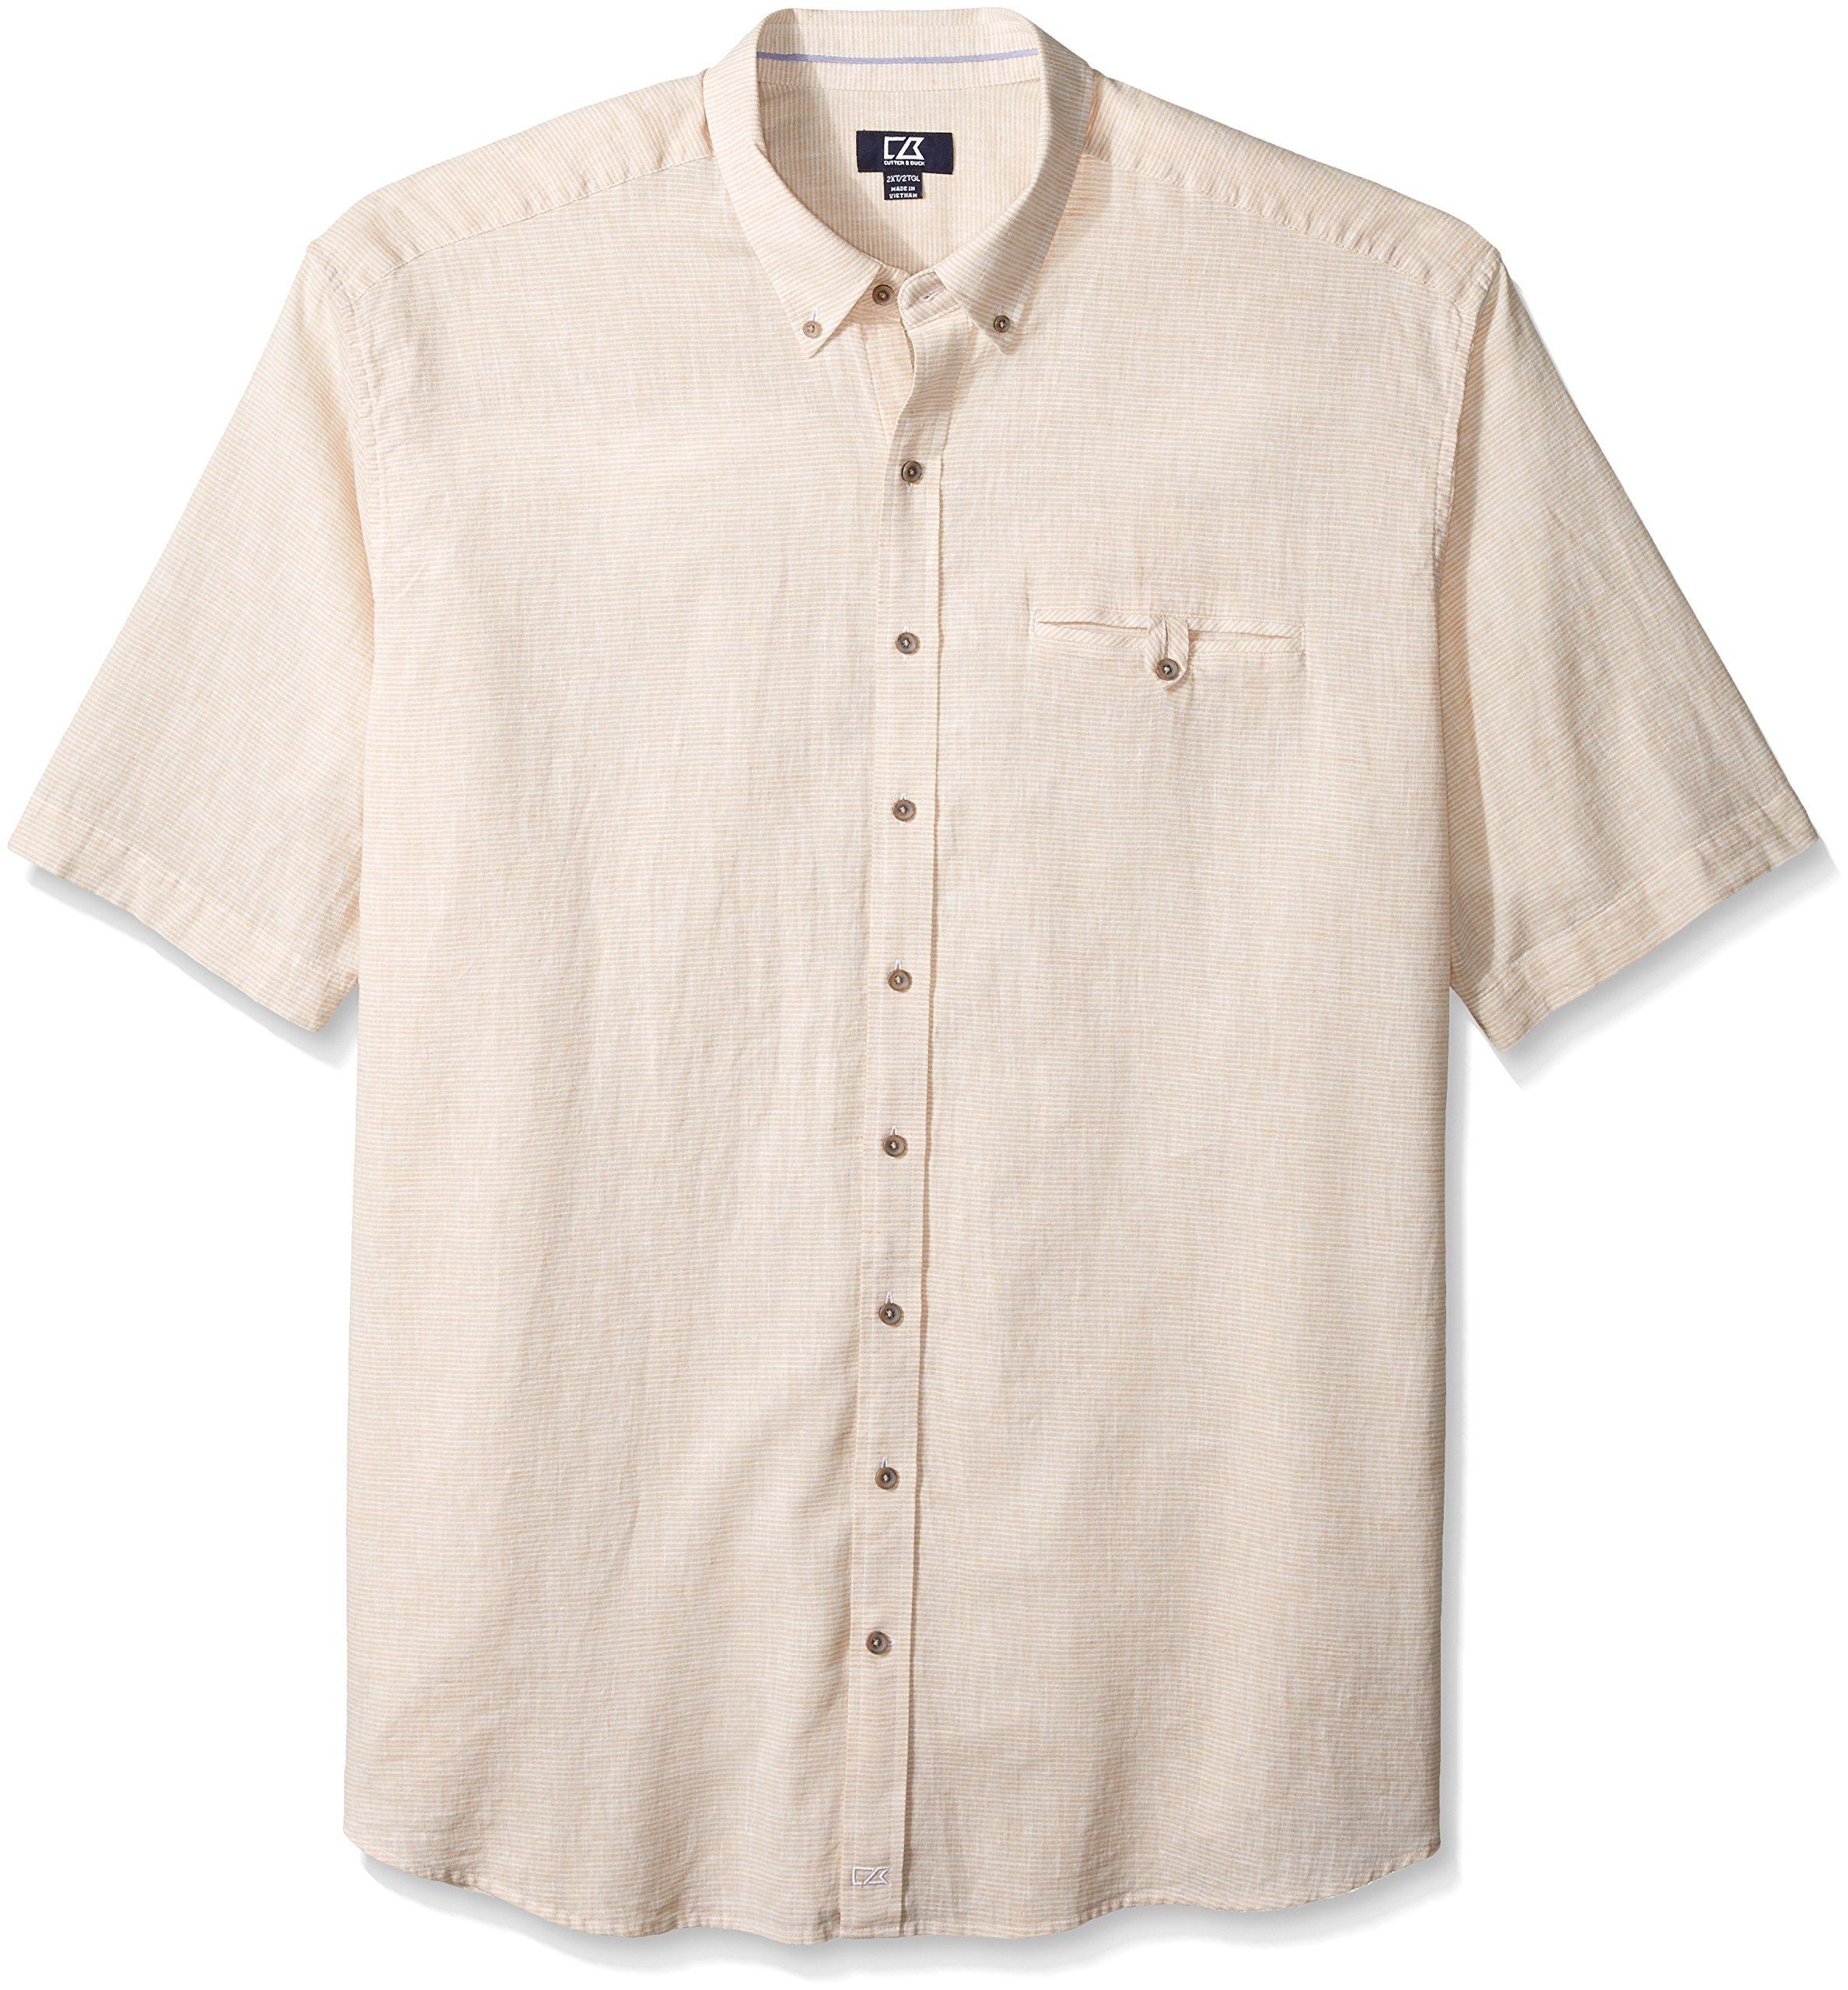 Cutter & Buck Men's Big and Tall Short Sleeve Cove Stripe Shirt, Khaki, 3X/Big